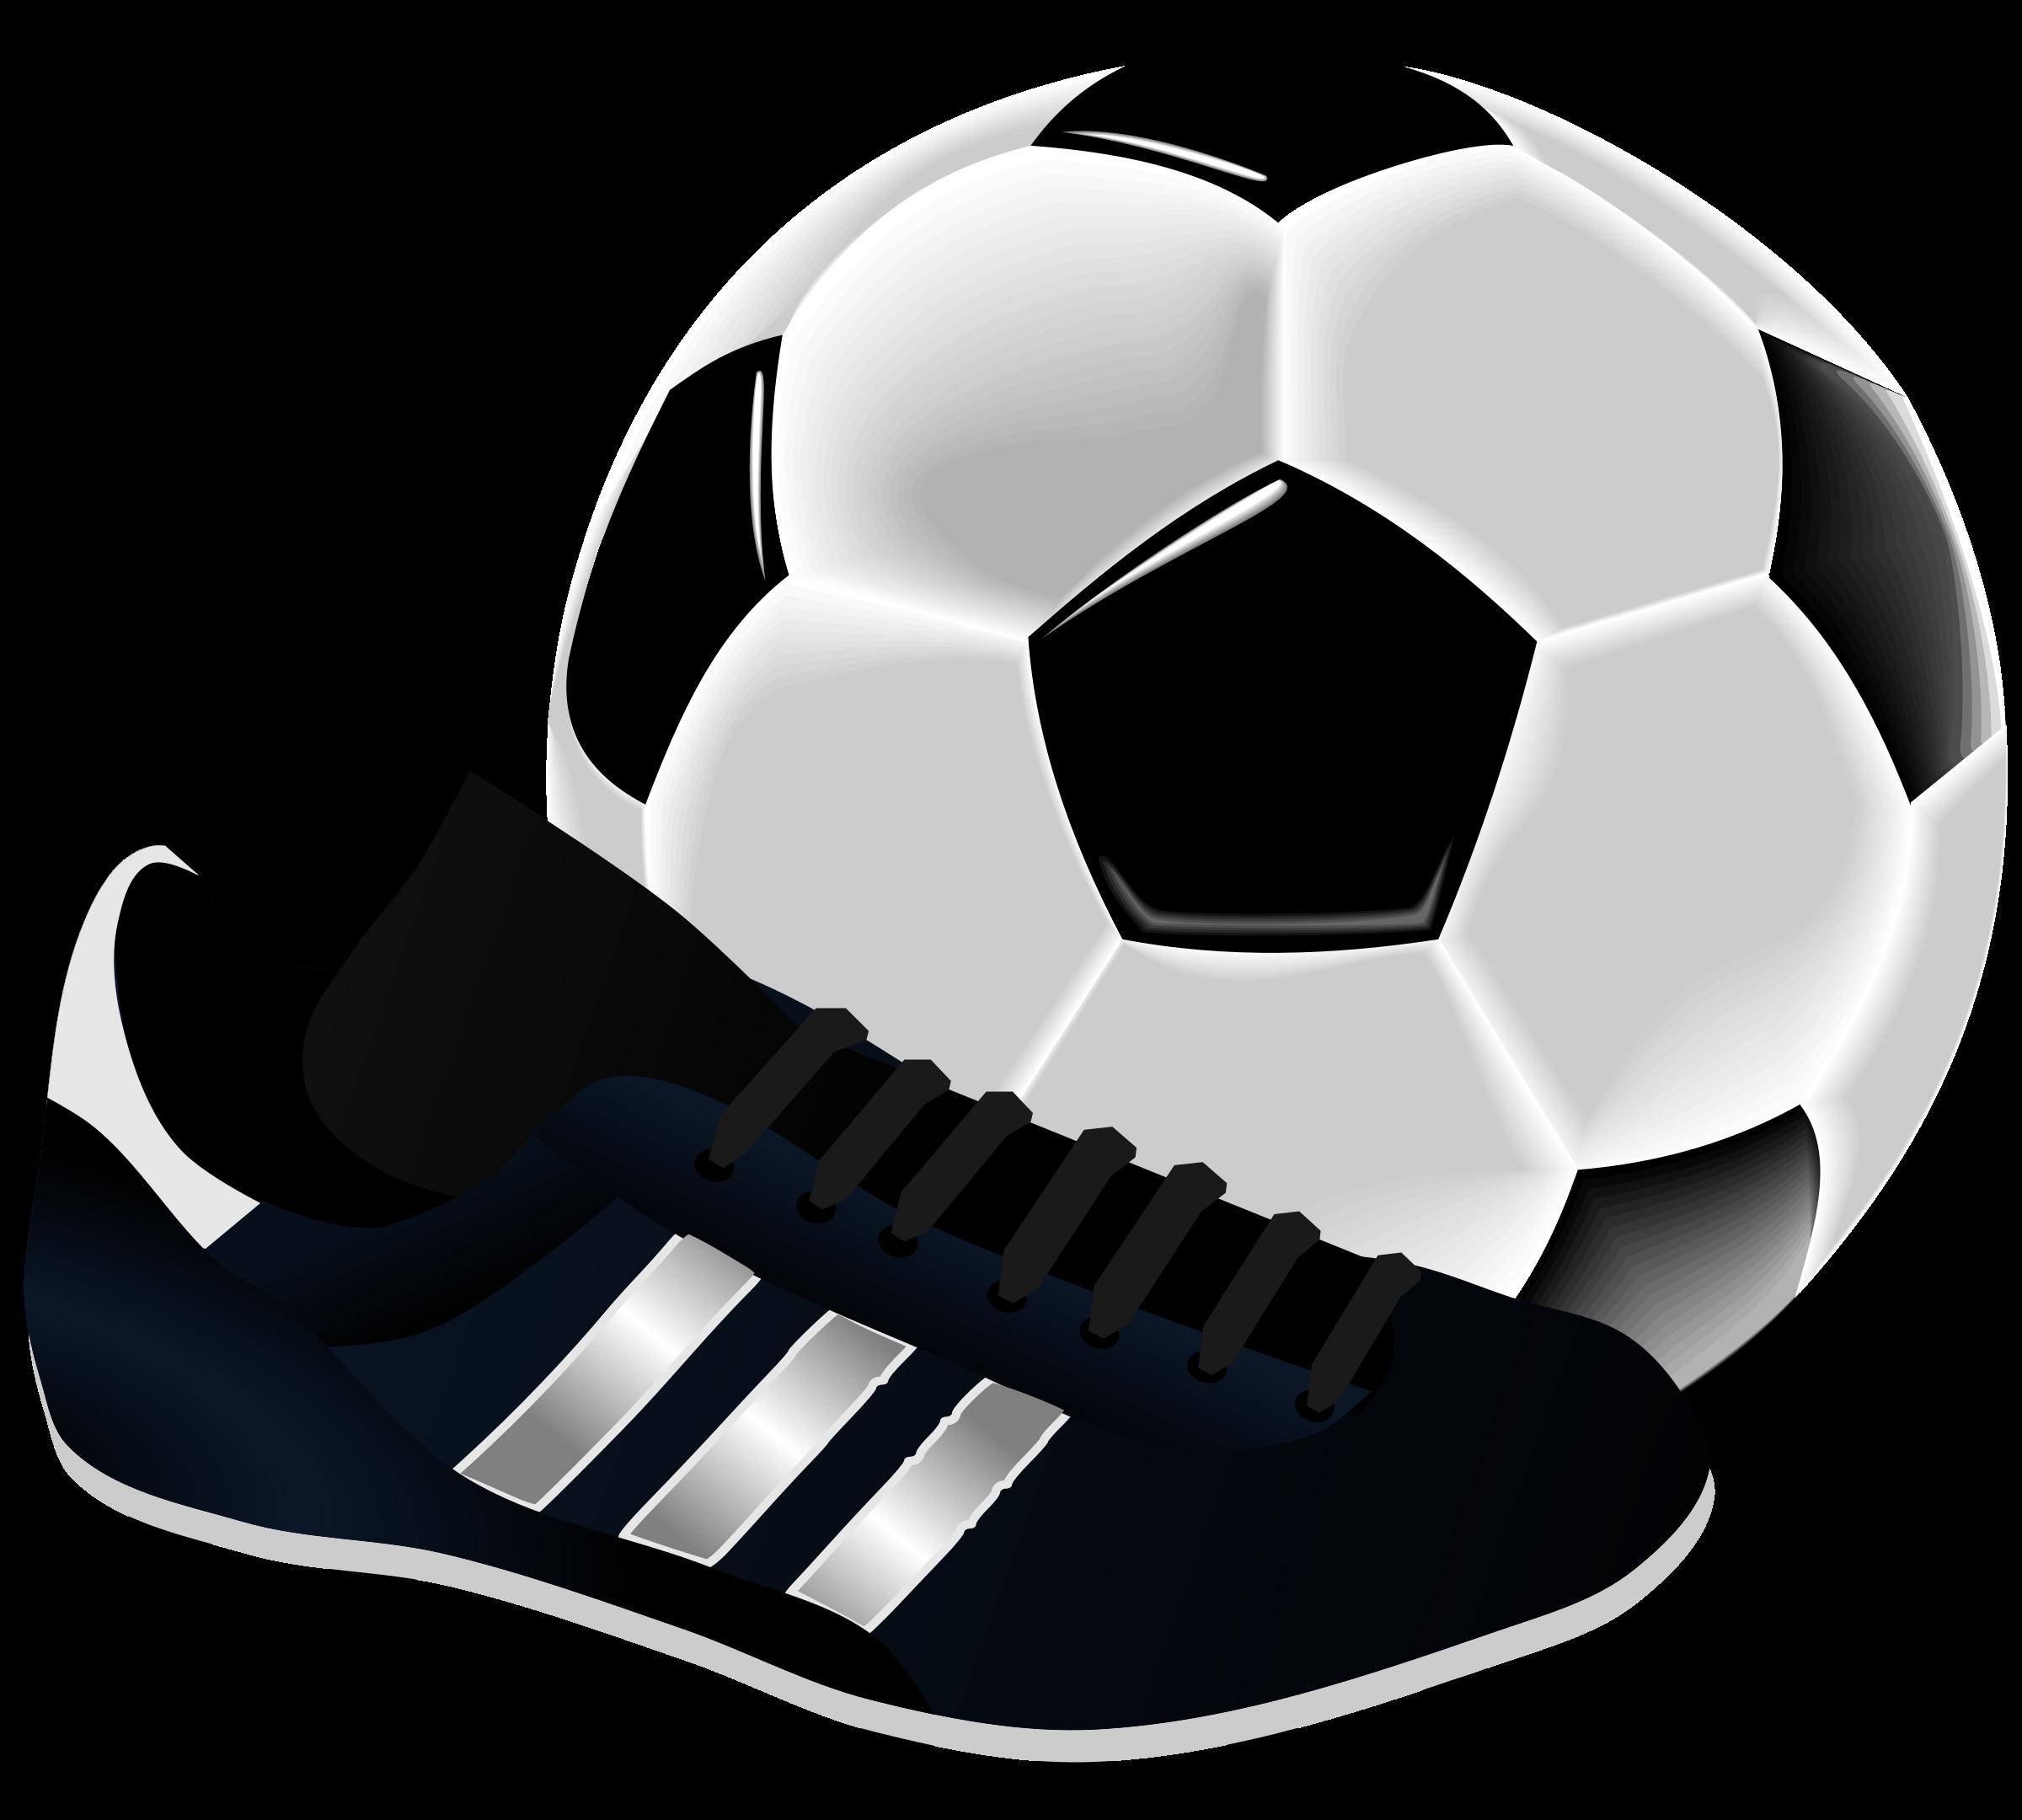 Soccer By Gnokii Soccer Ball Soccer Notebook Soccer